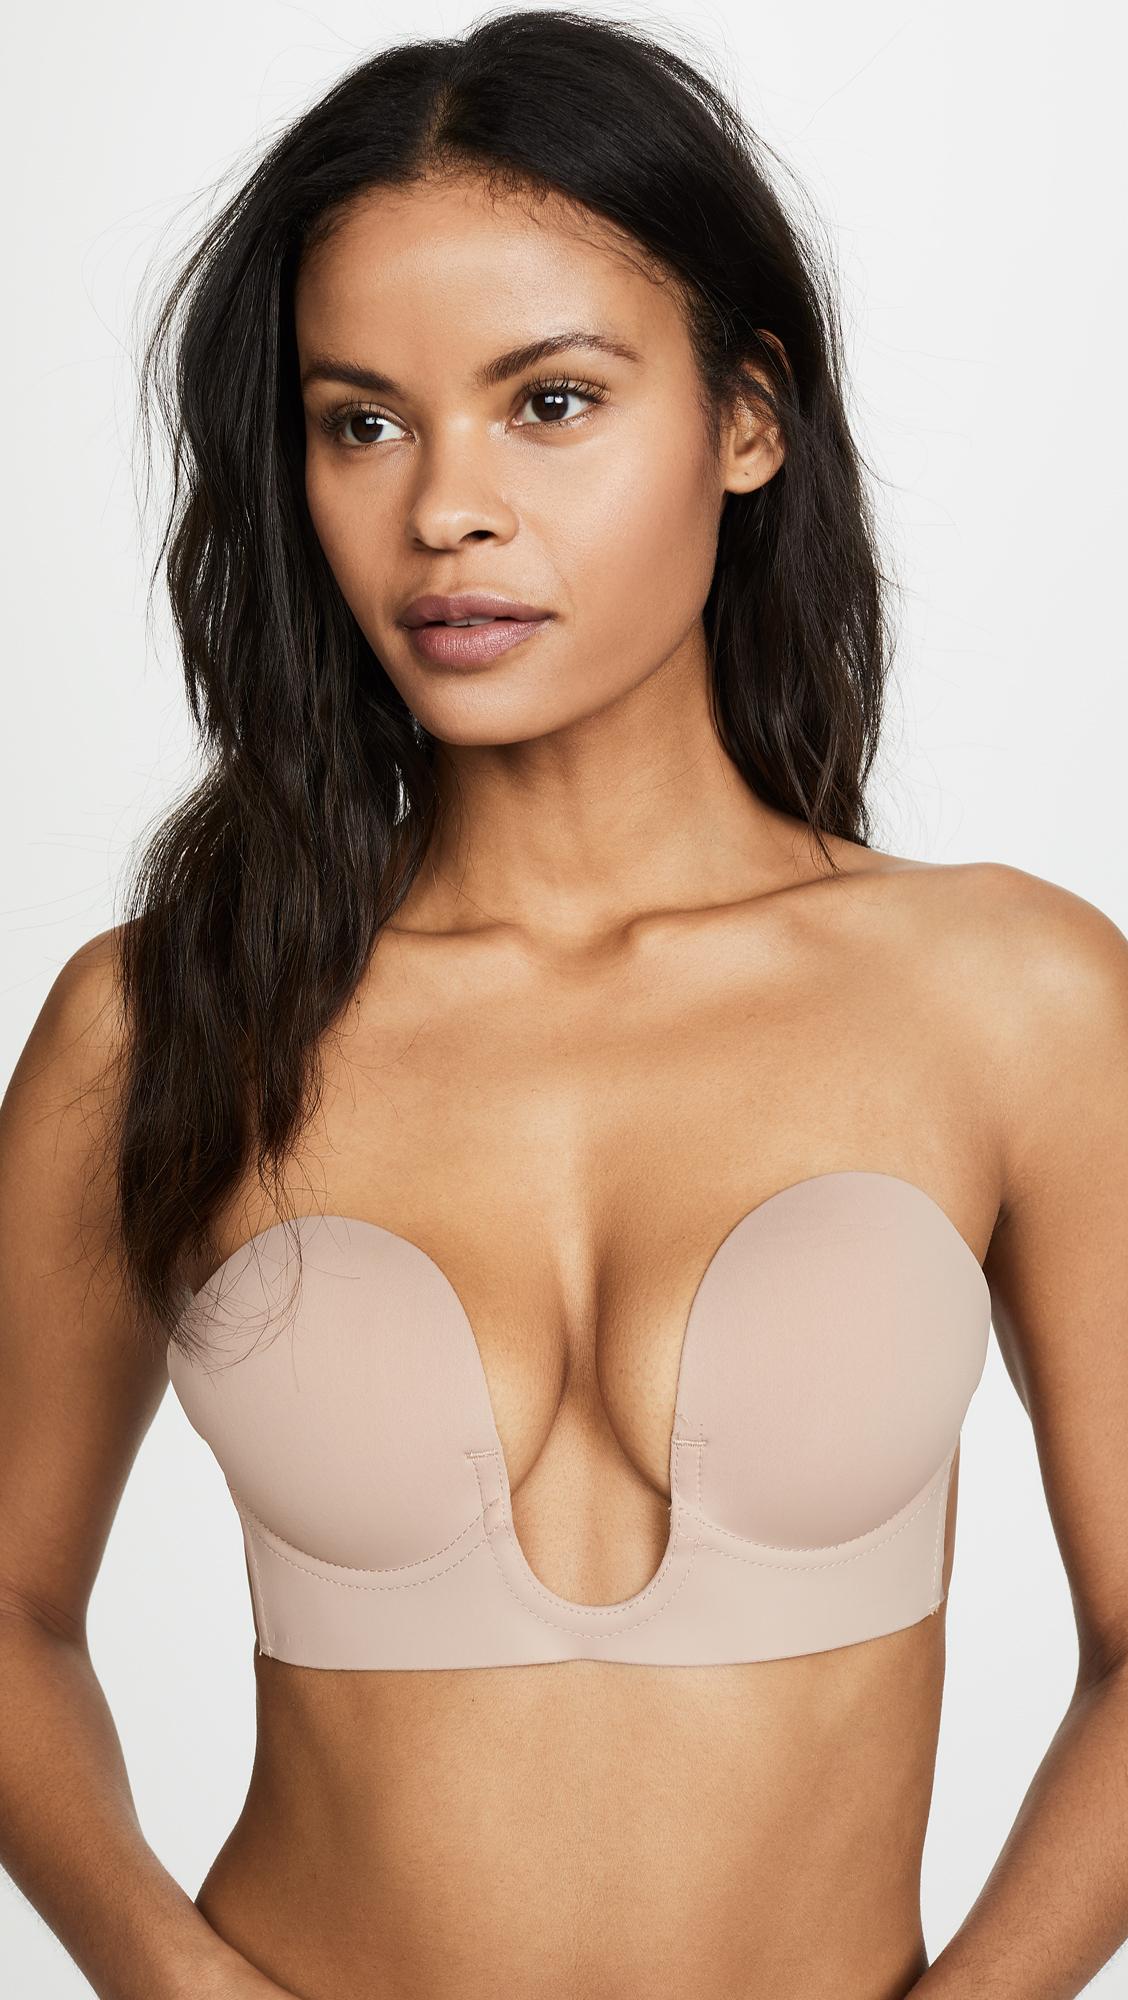 edef43b75293 Fashion Forms U Plunge Backless Strapless Bra